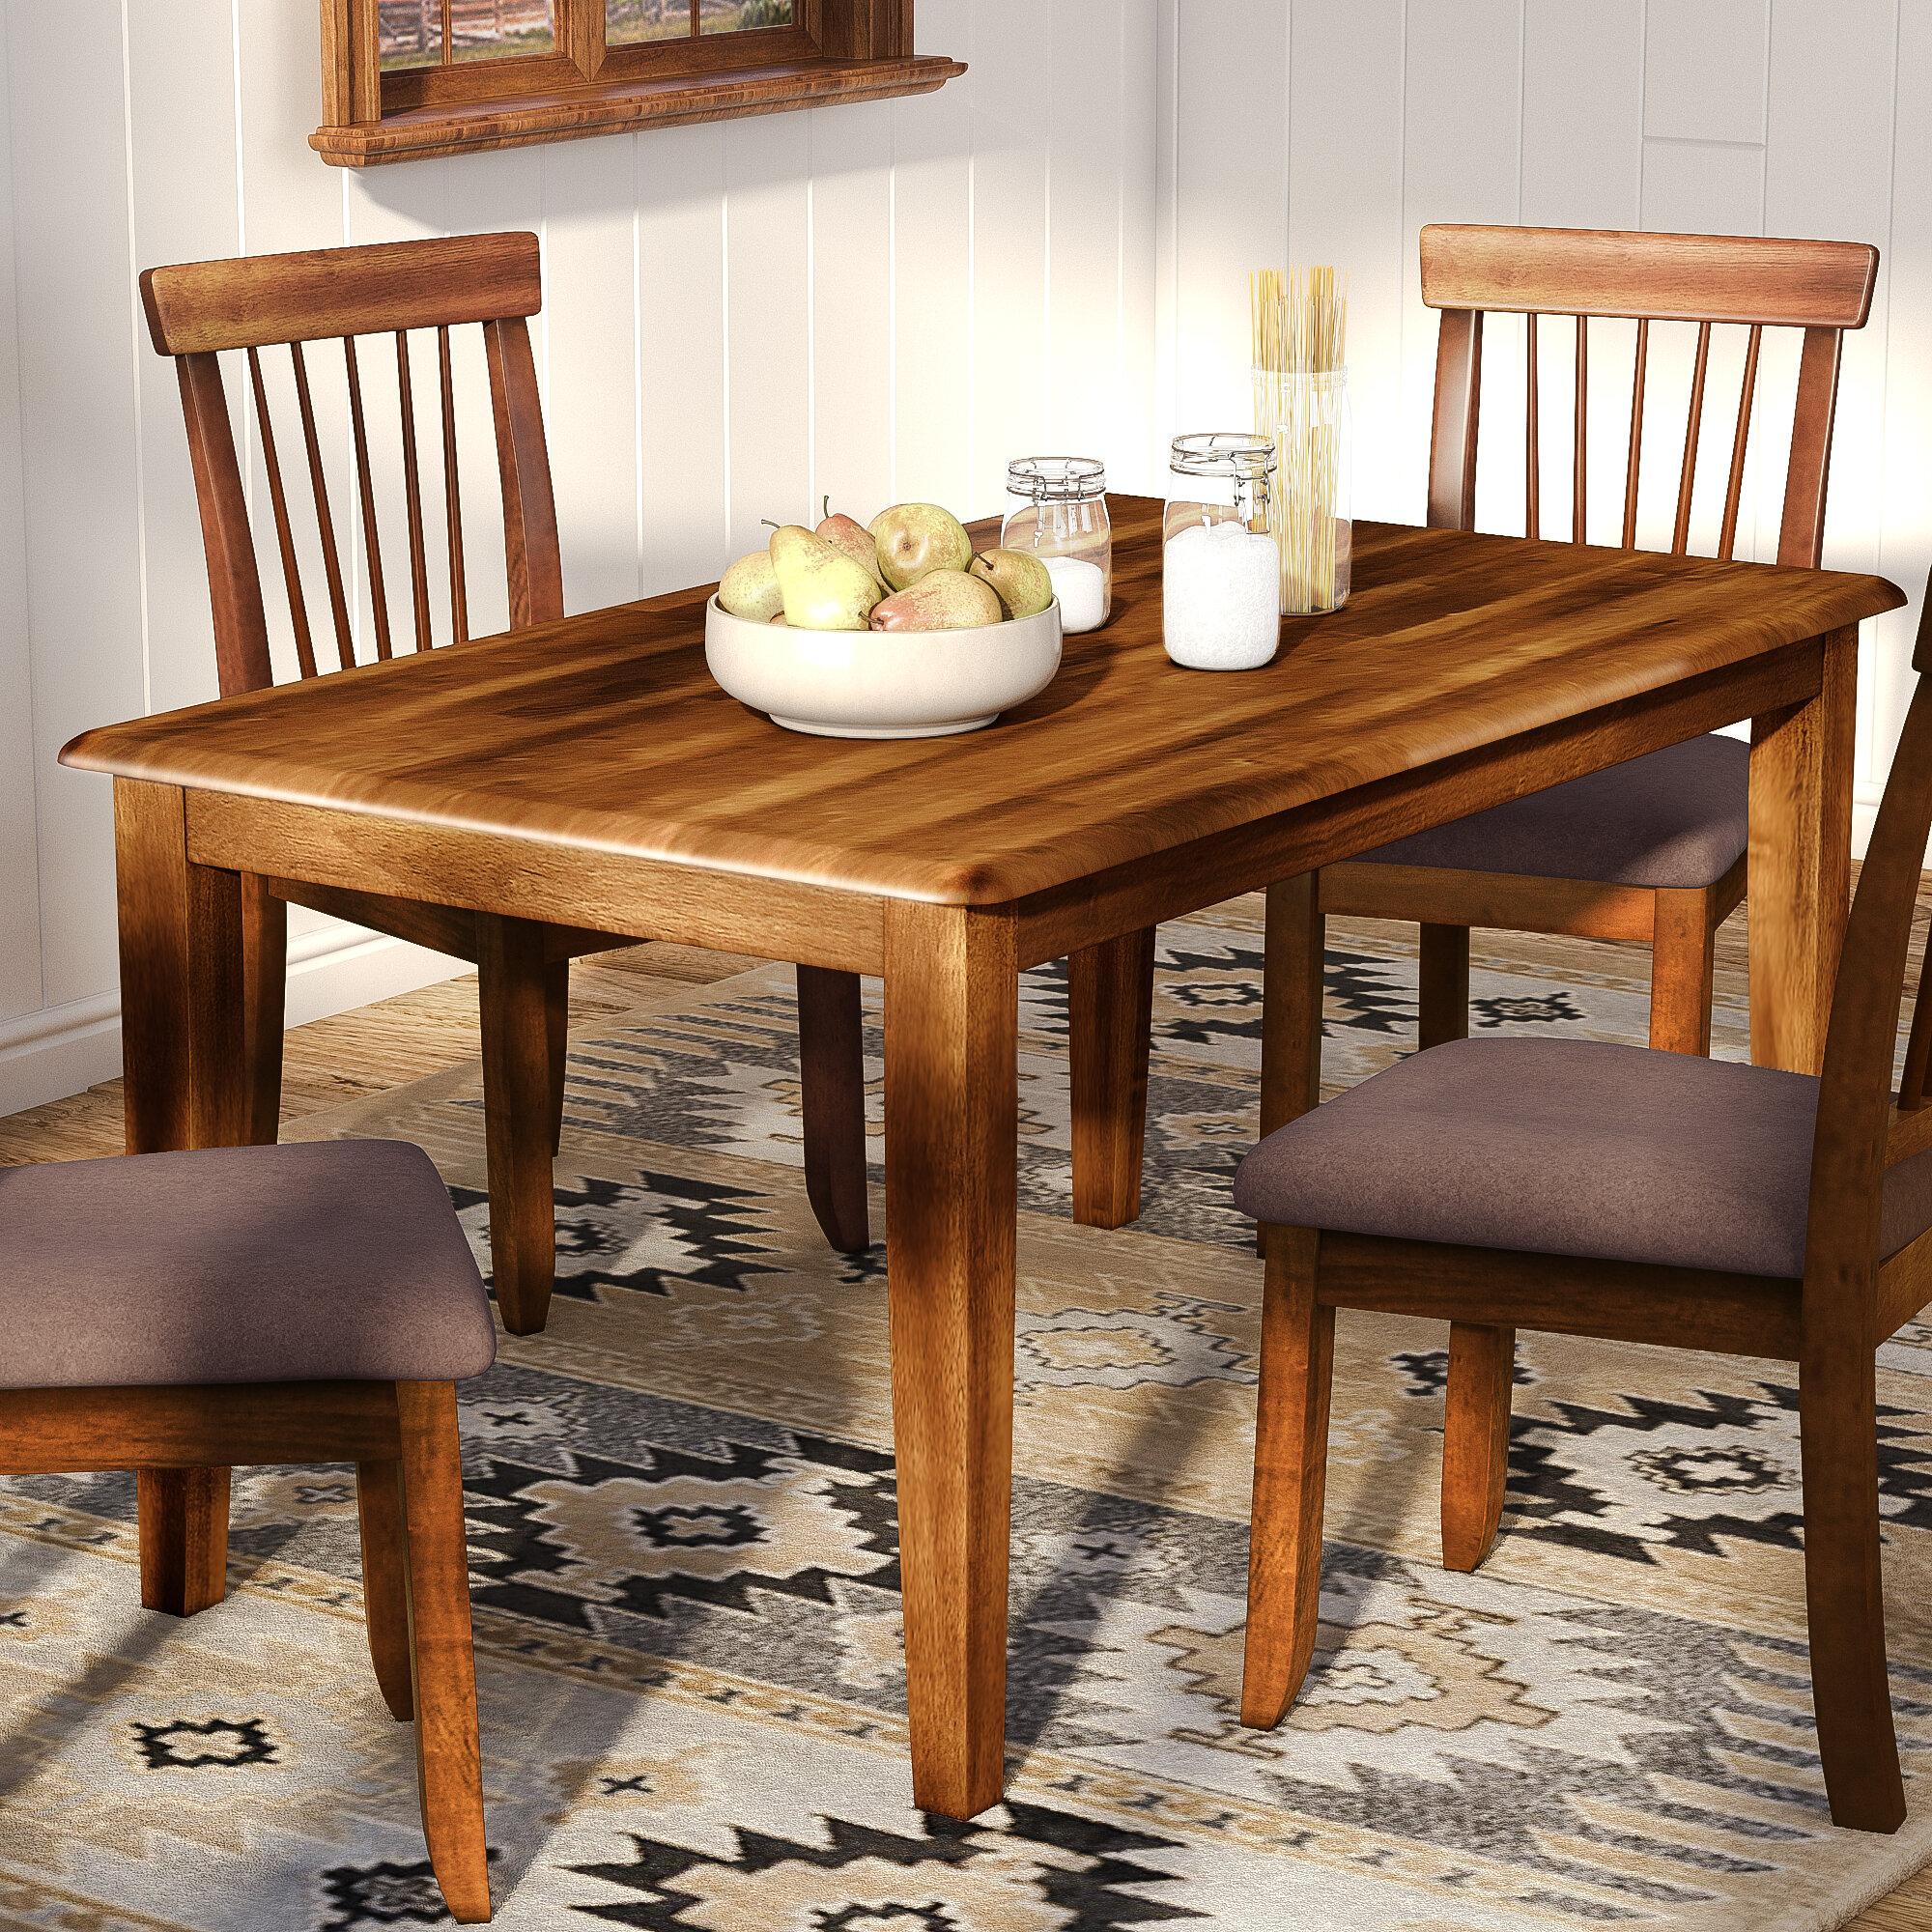 "Red Barrel Studio® Pevensey 36"" Dining Table & Reviews | Wayfair"